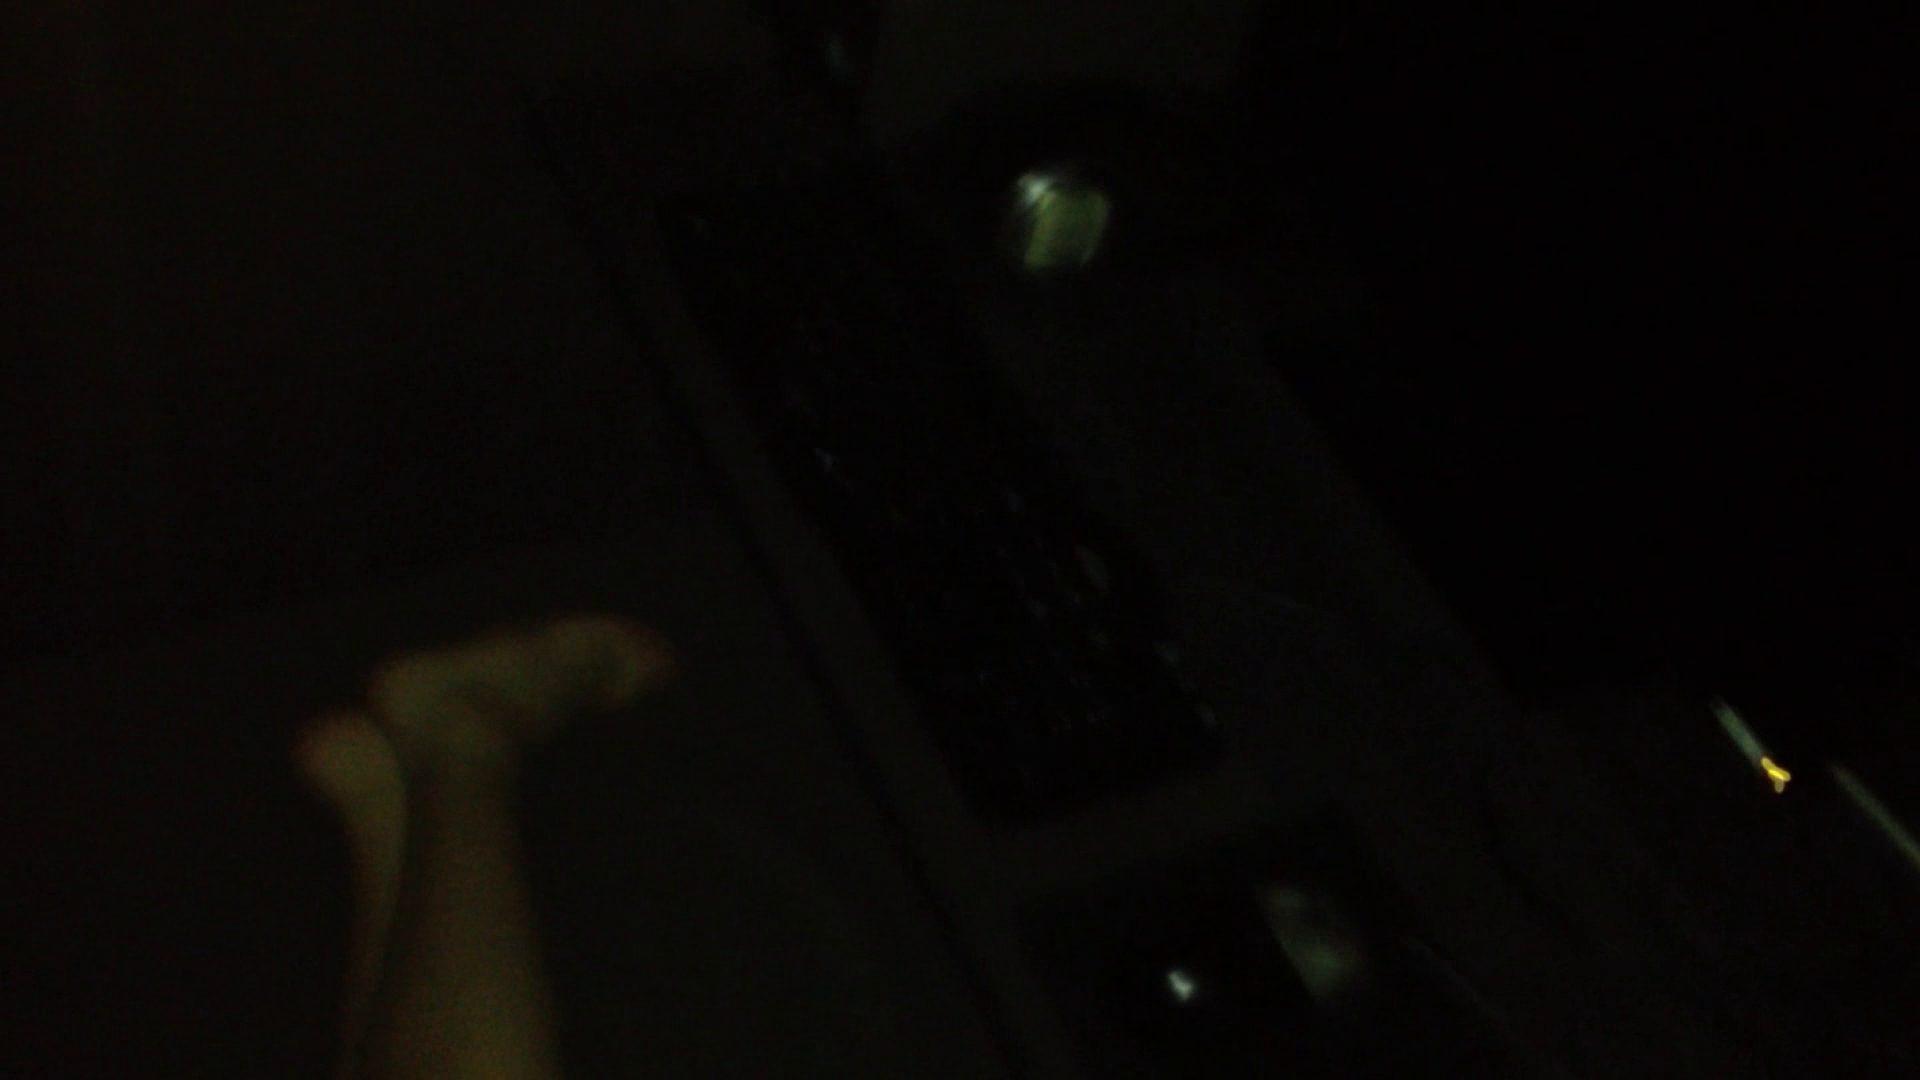 vol.45 【YMちゃん】現役JD純白パンツのお嬢様 友人・知人 おまんこ無修正動画無料 104枚 28